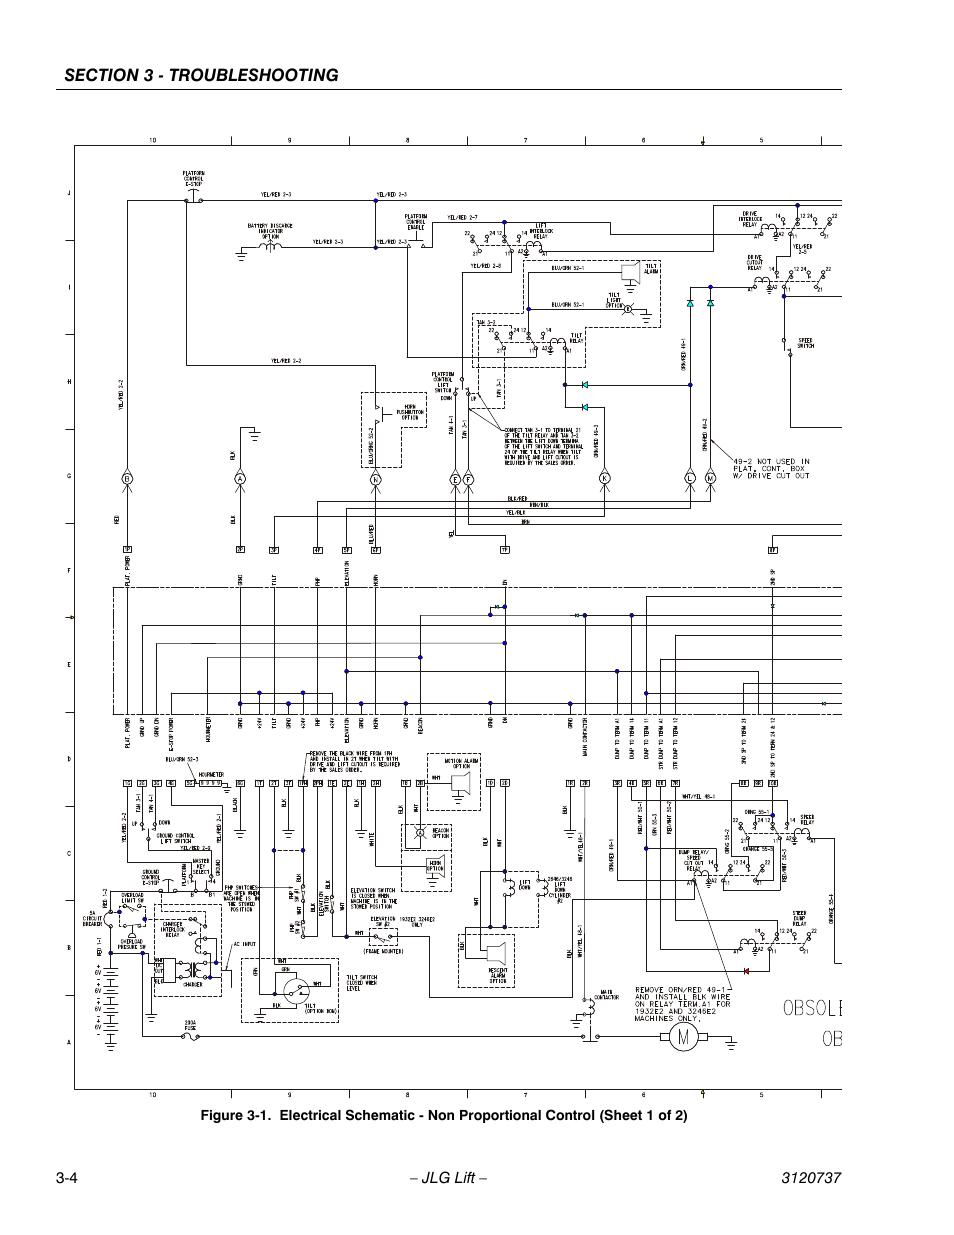 Jlg Lift Wiring Diagram